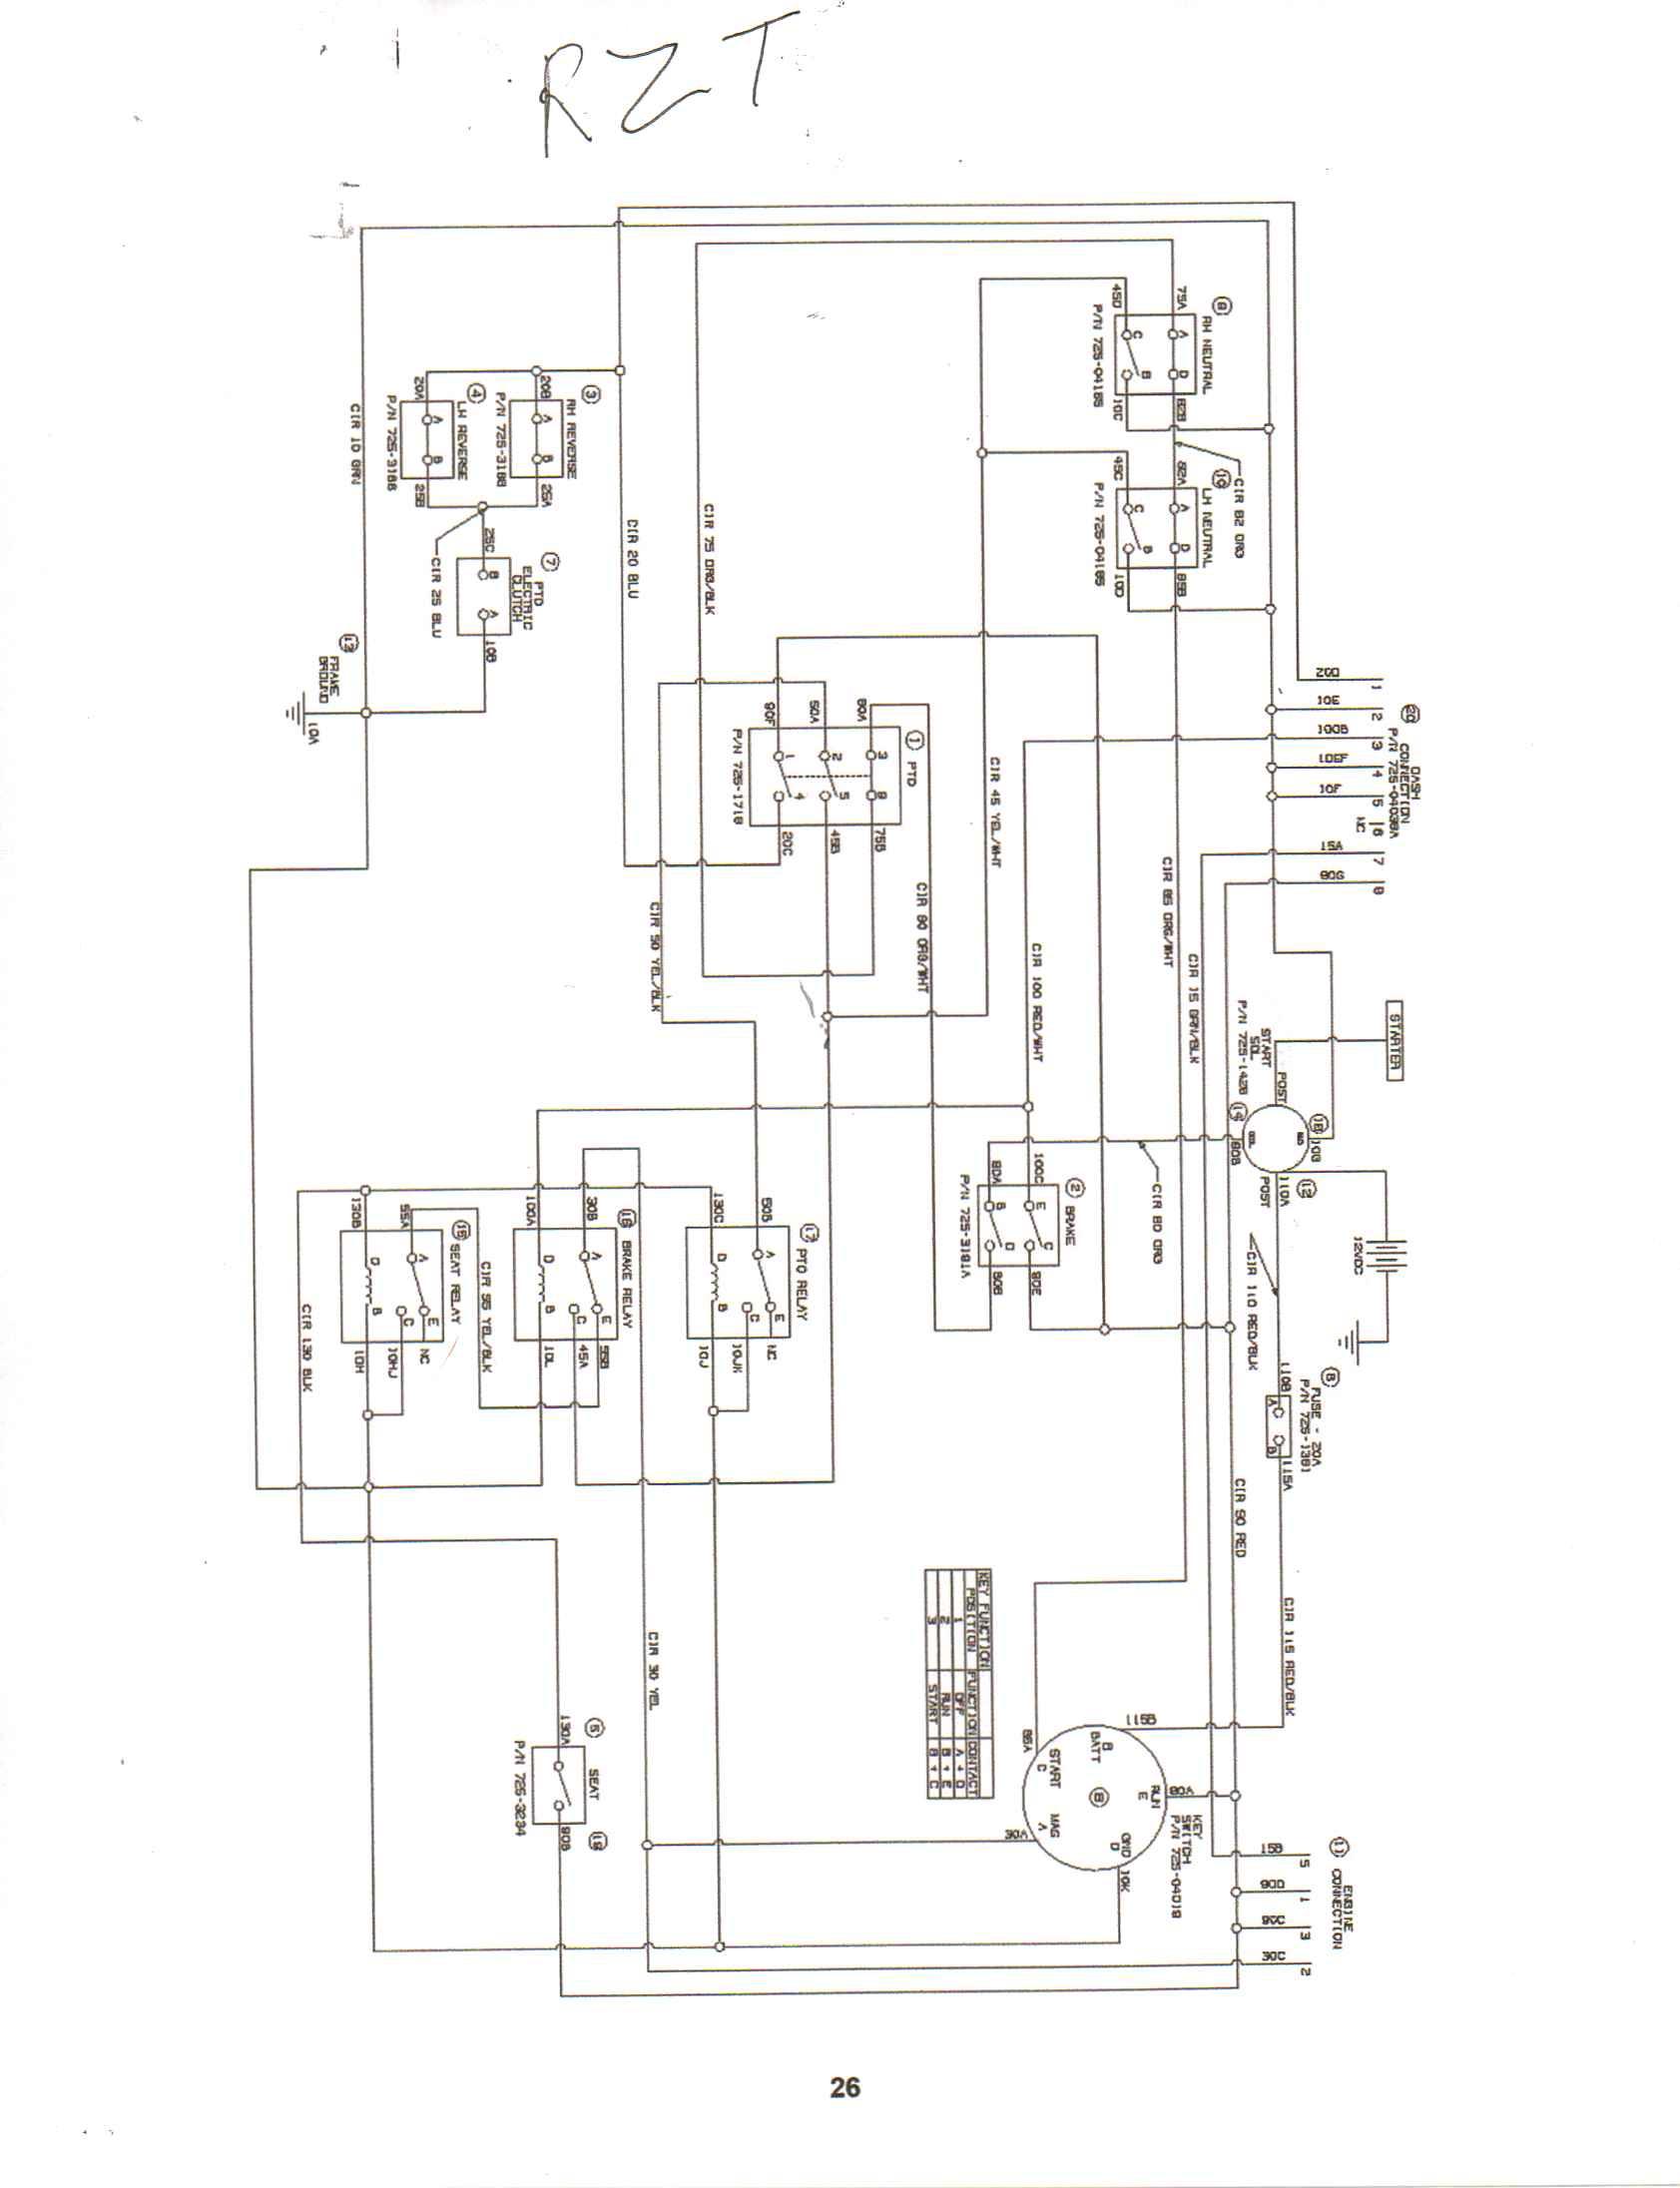 Cub Cadet Pto Wiring Diagram